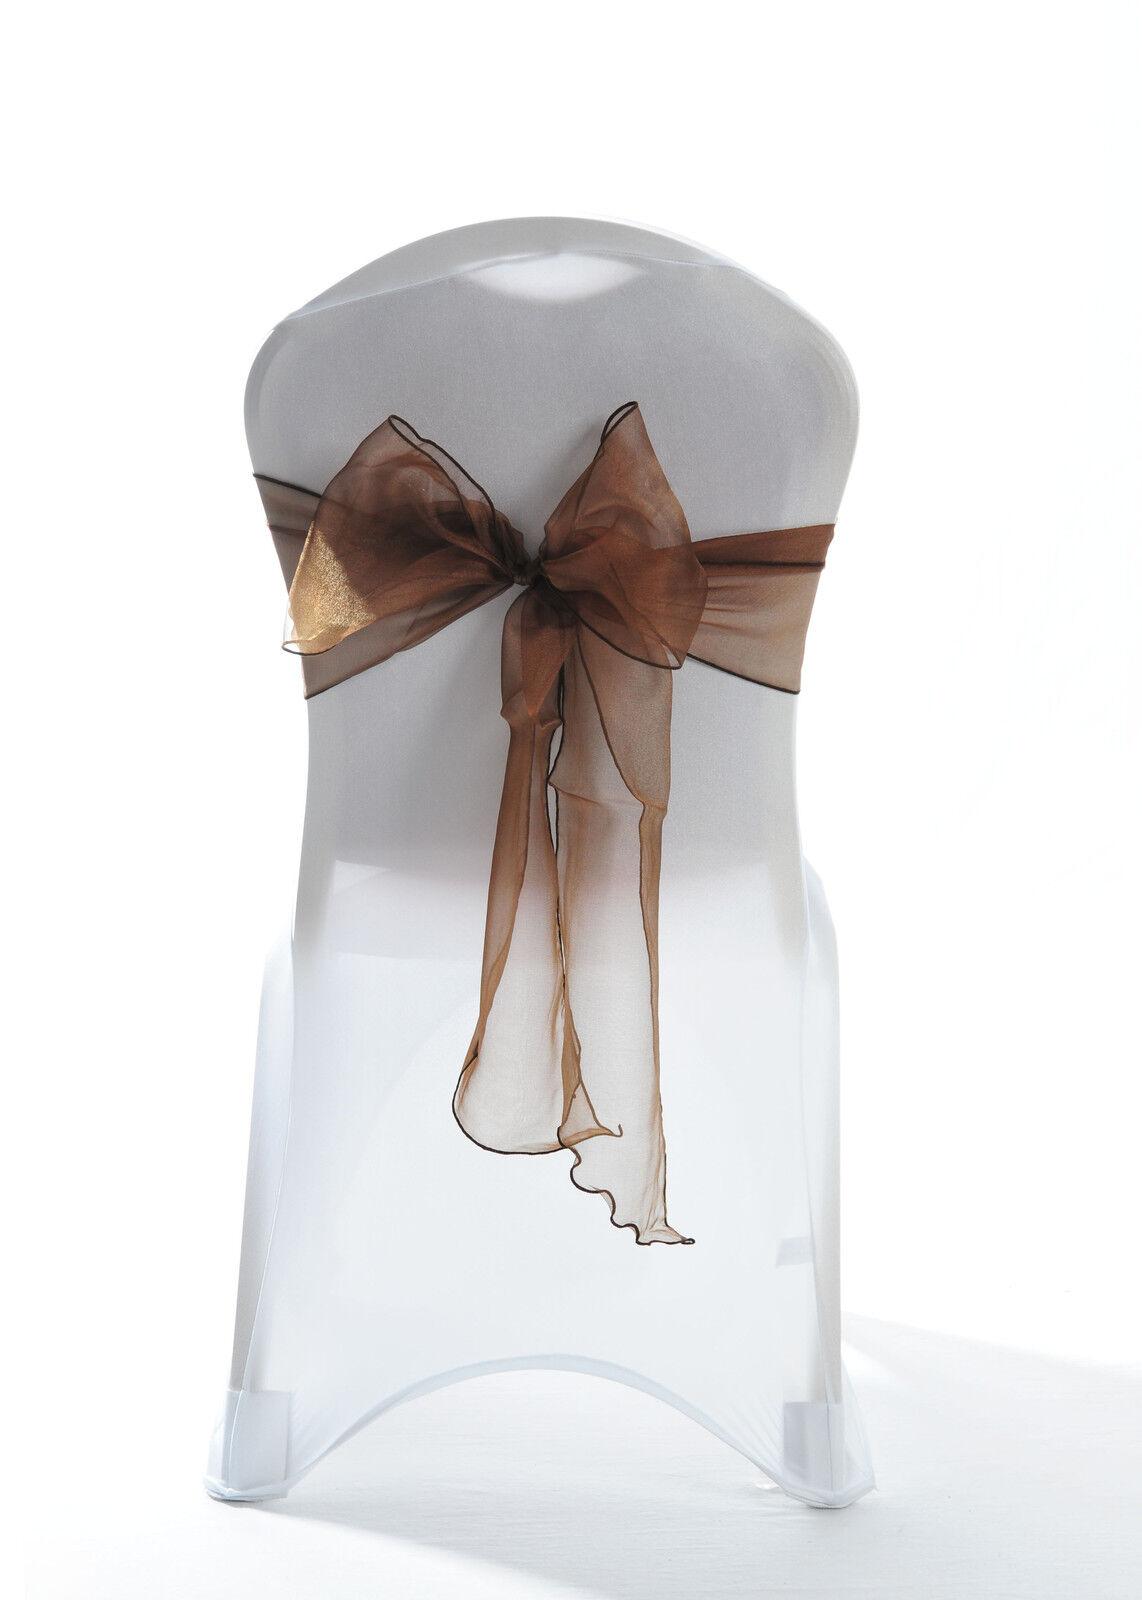 100 Chocolate Dark braun Sparkle Organza Chair Cover Bow Sash Wedding UK